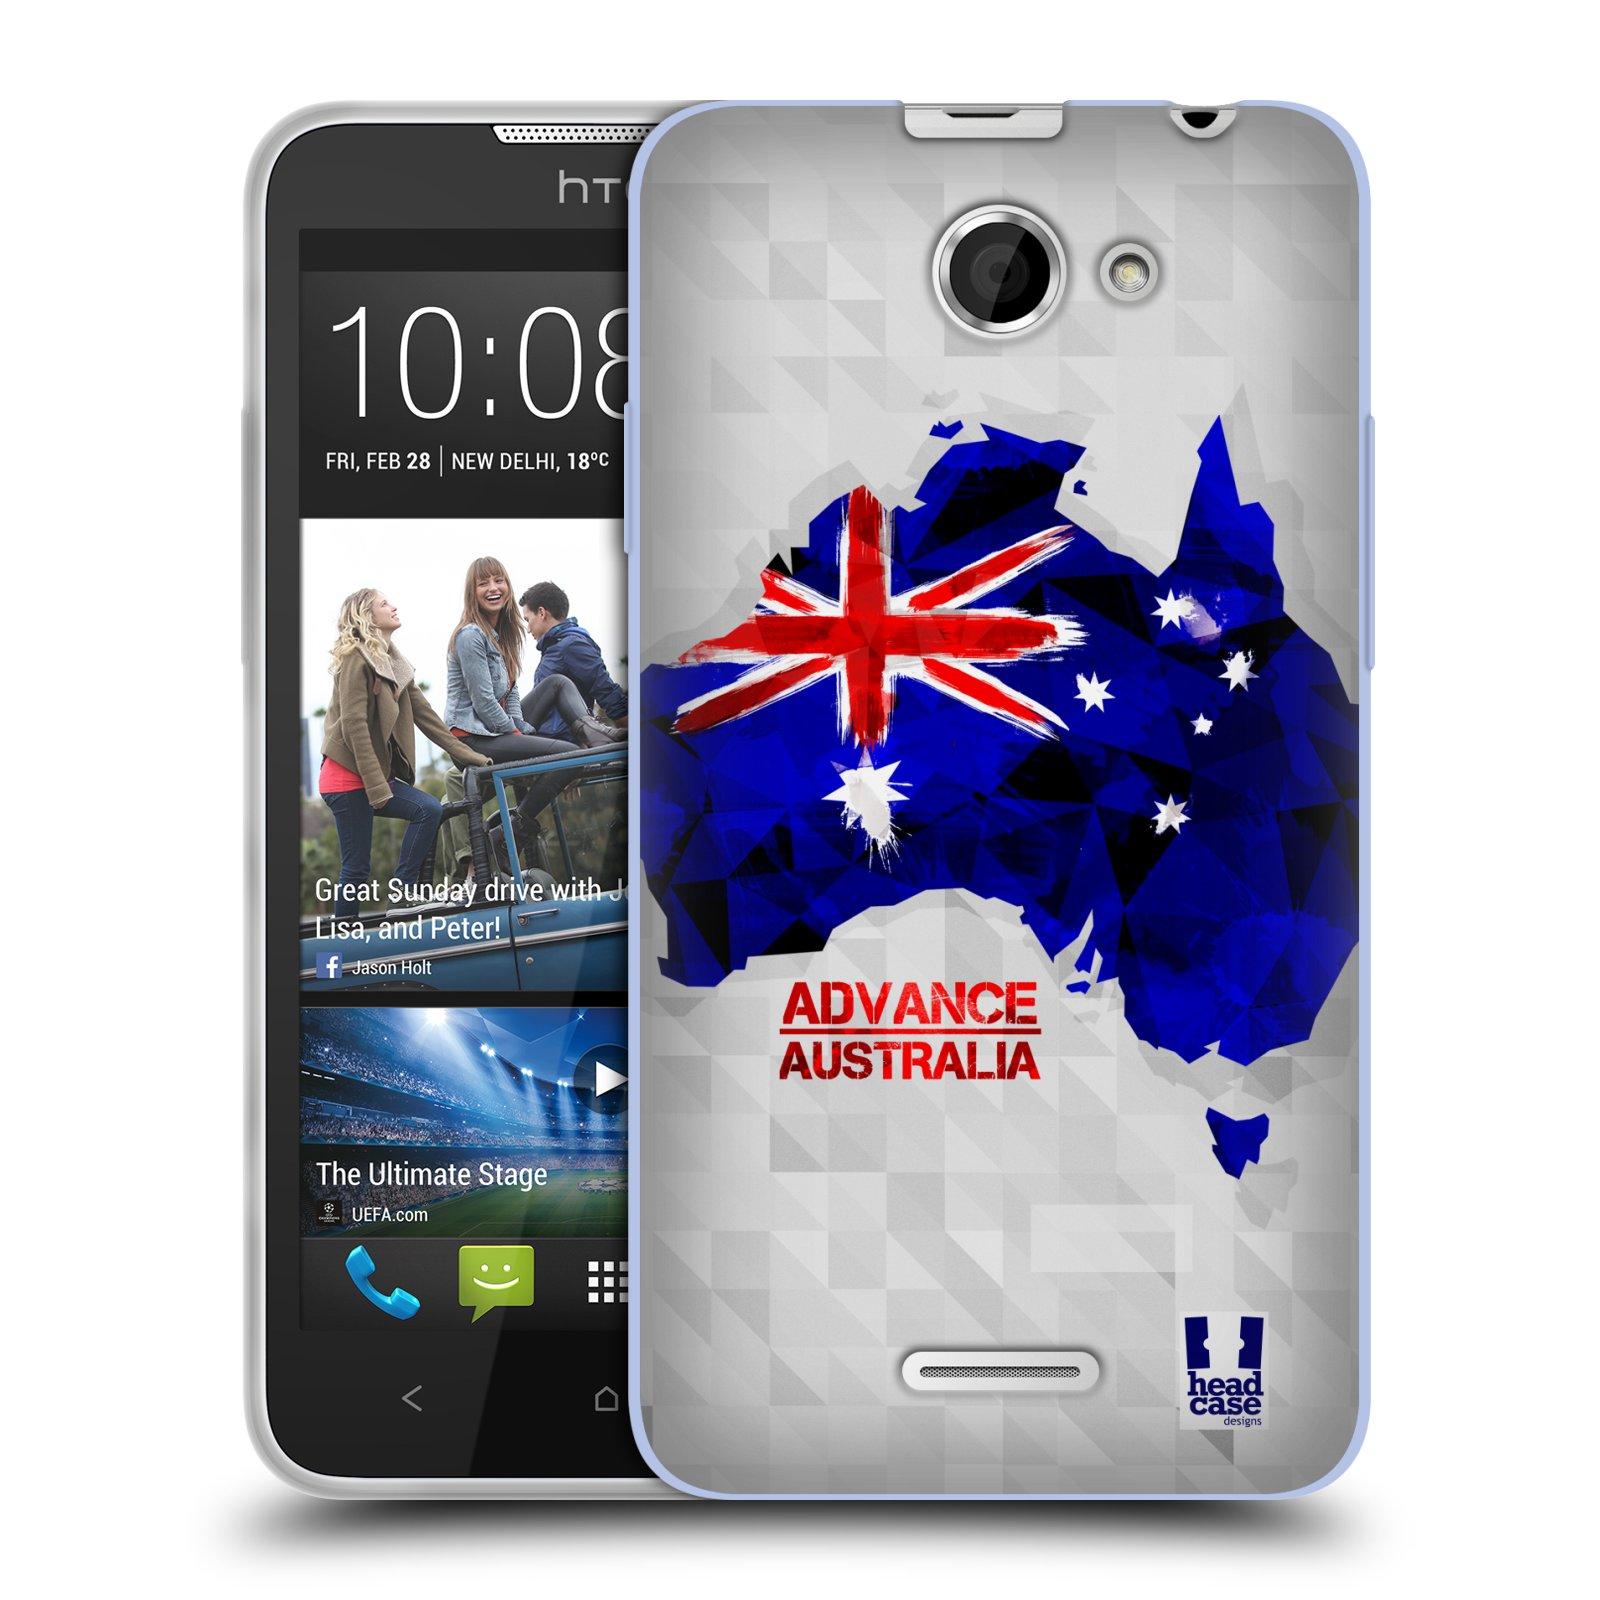 Silikonové pouzdro na mobil HTC Desire 516 HEAD CASE GEOMAPA AUSTRÁLIE (Silikonový kryt či obal na mobilní telefon HTC Desire 516 Dual SIM)